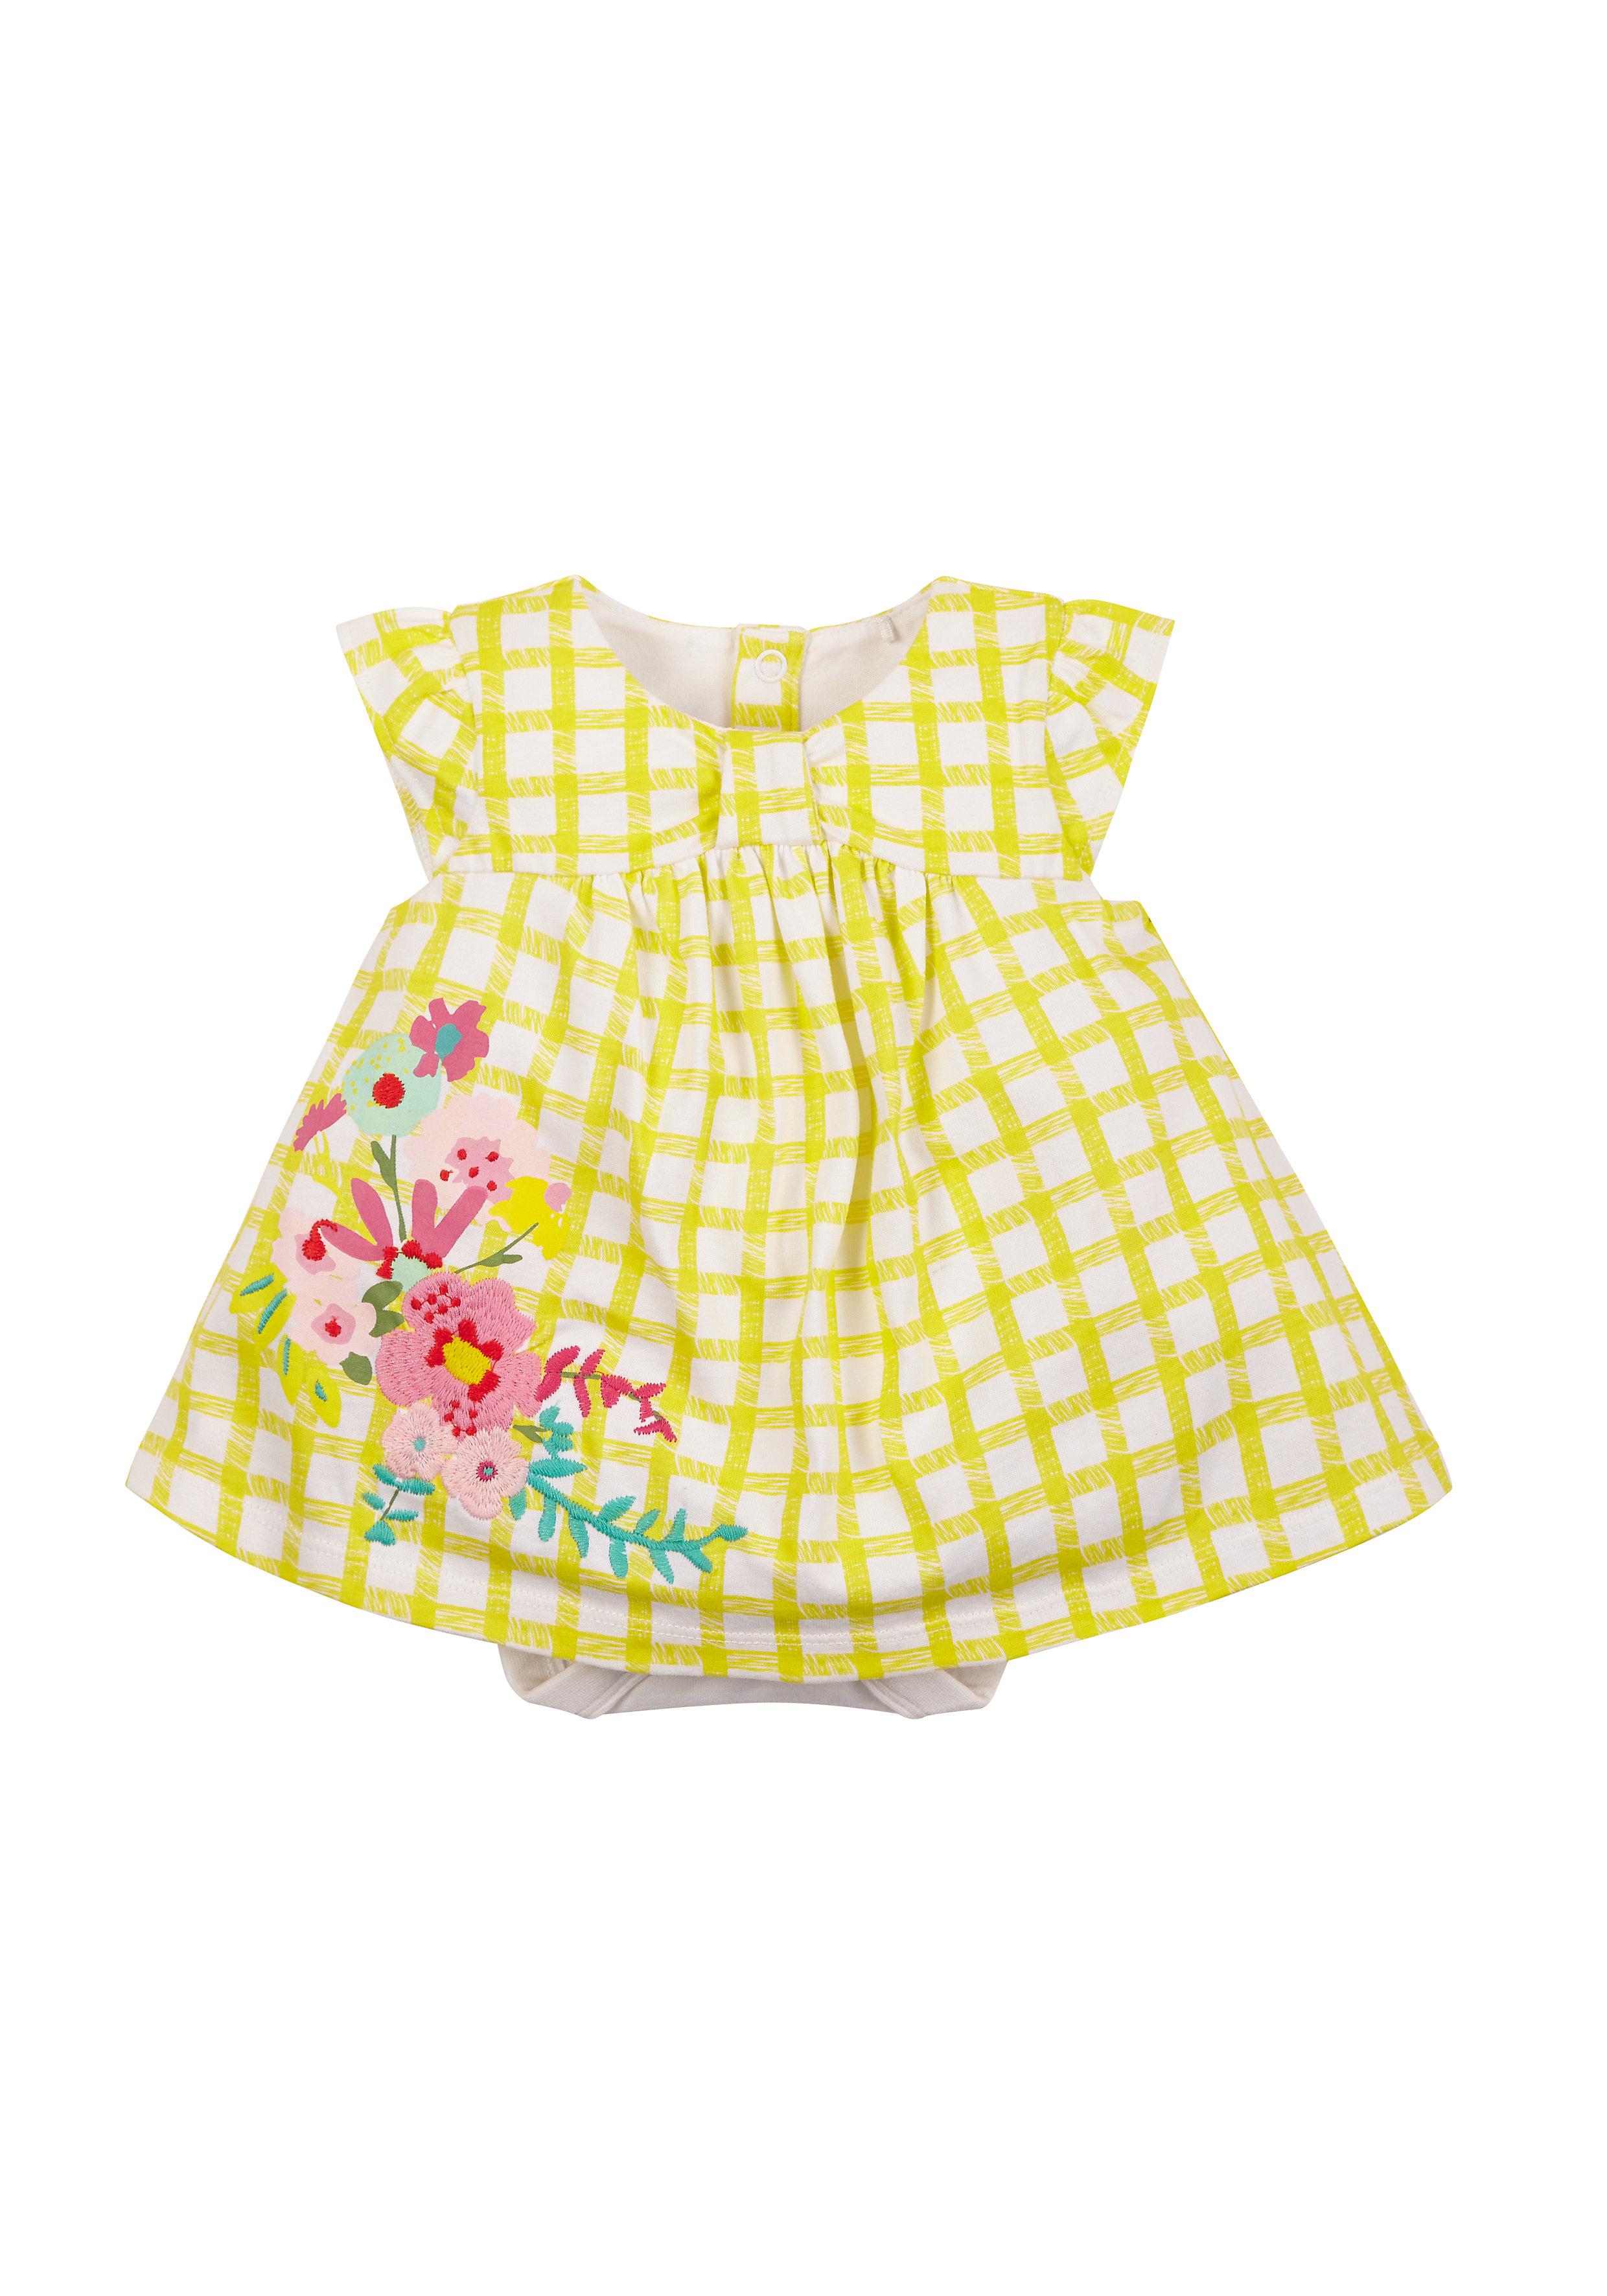 Mothercare | Girls Gingham Floral Romper Dress